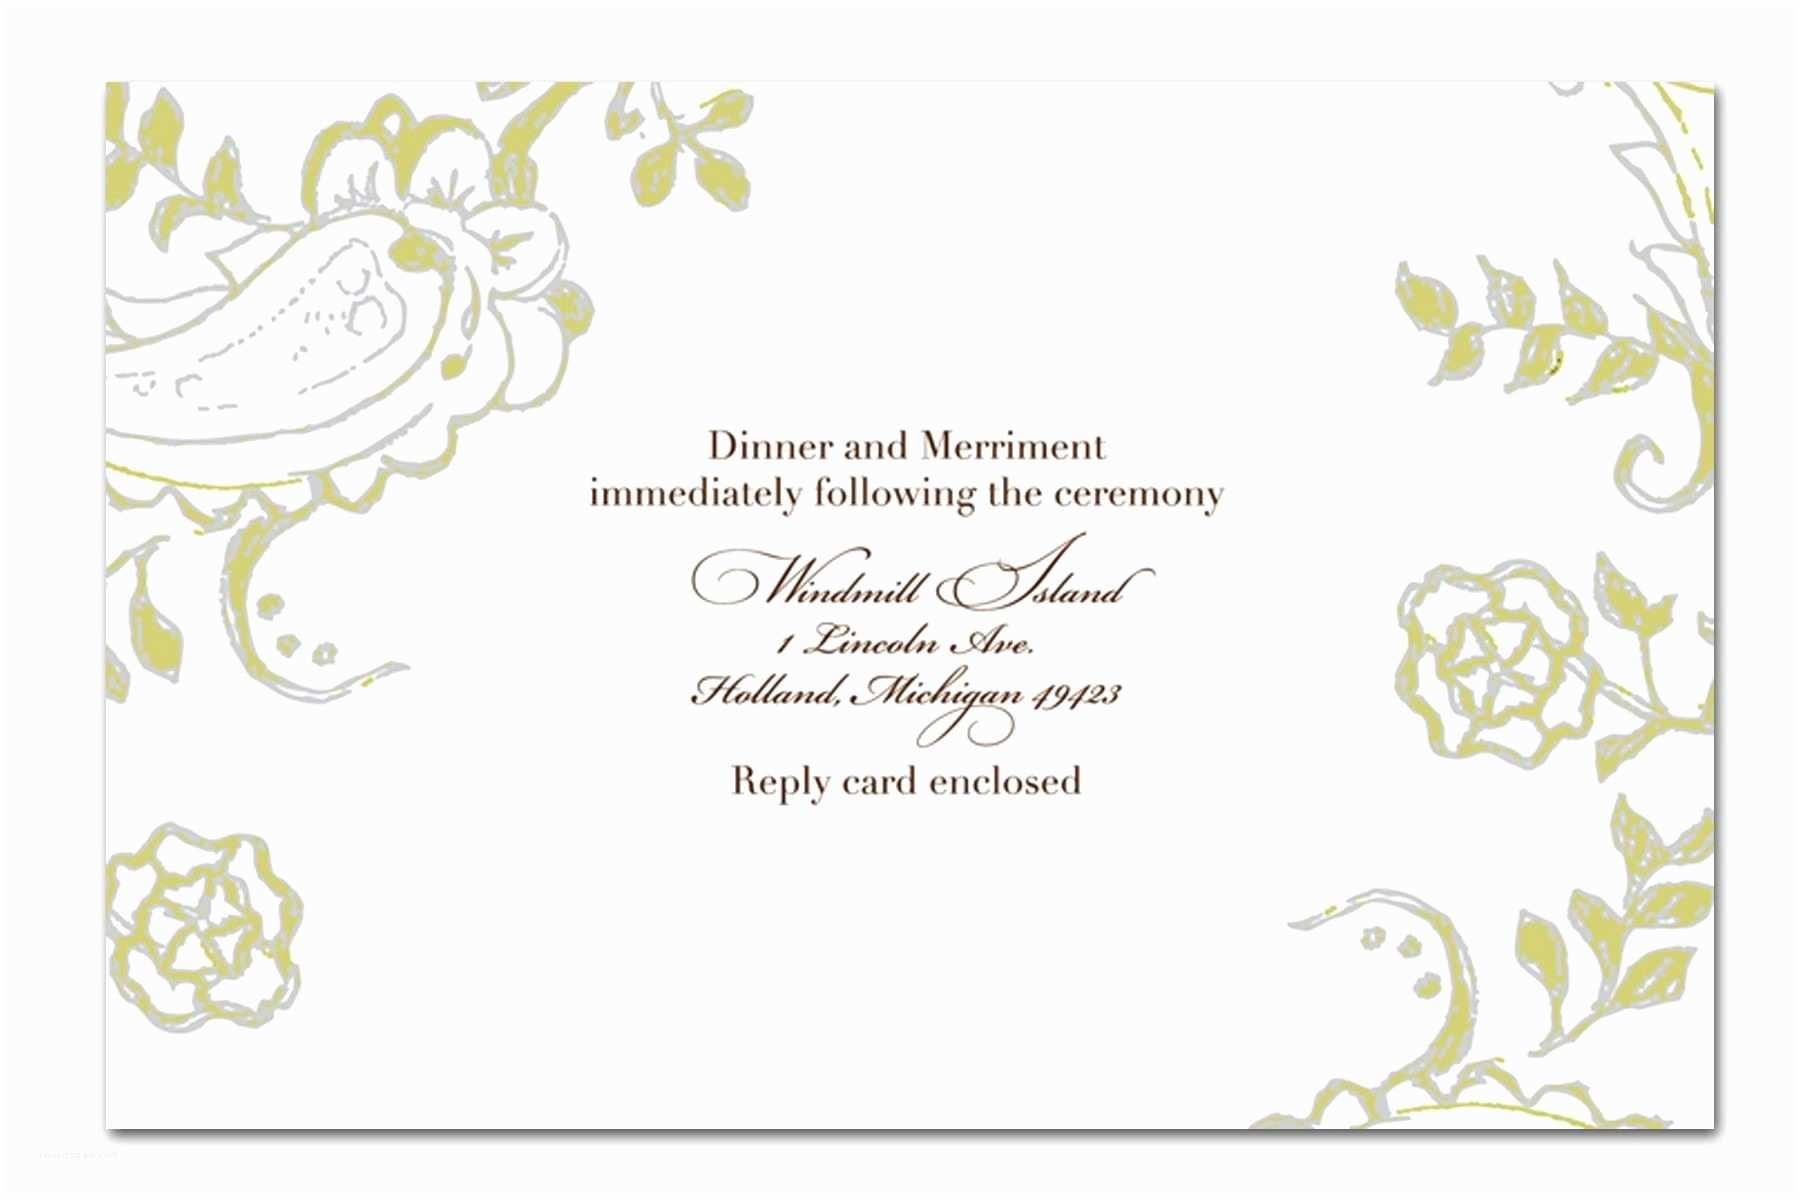 Wedding Invitation Generator Unique Wedding Invitation Card Editing Line